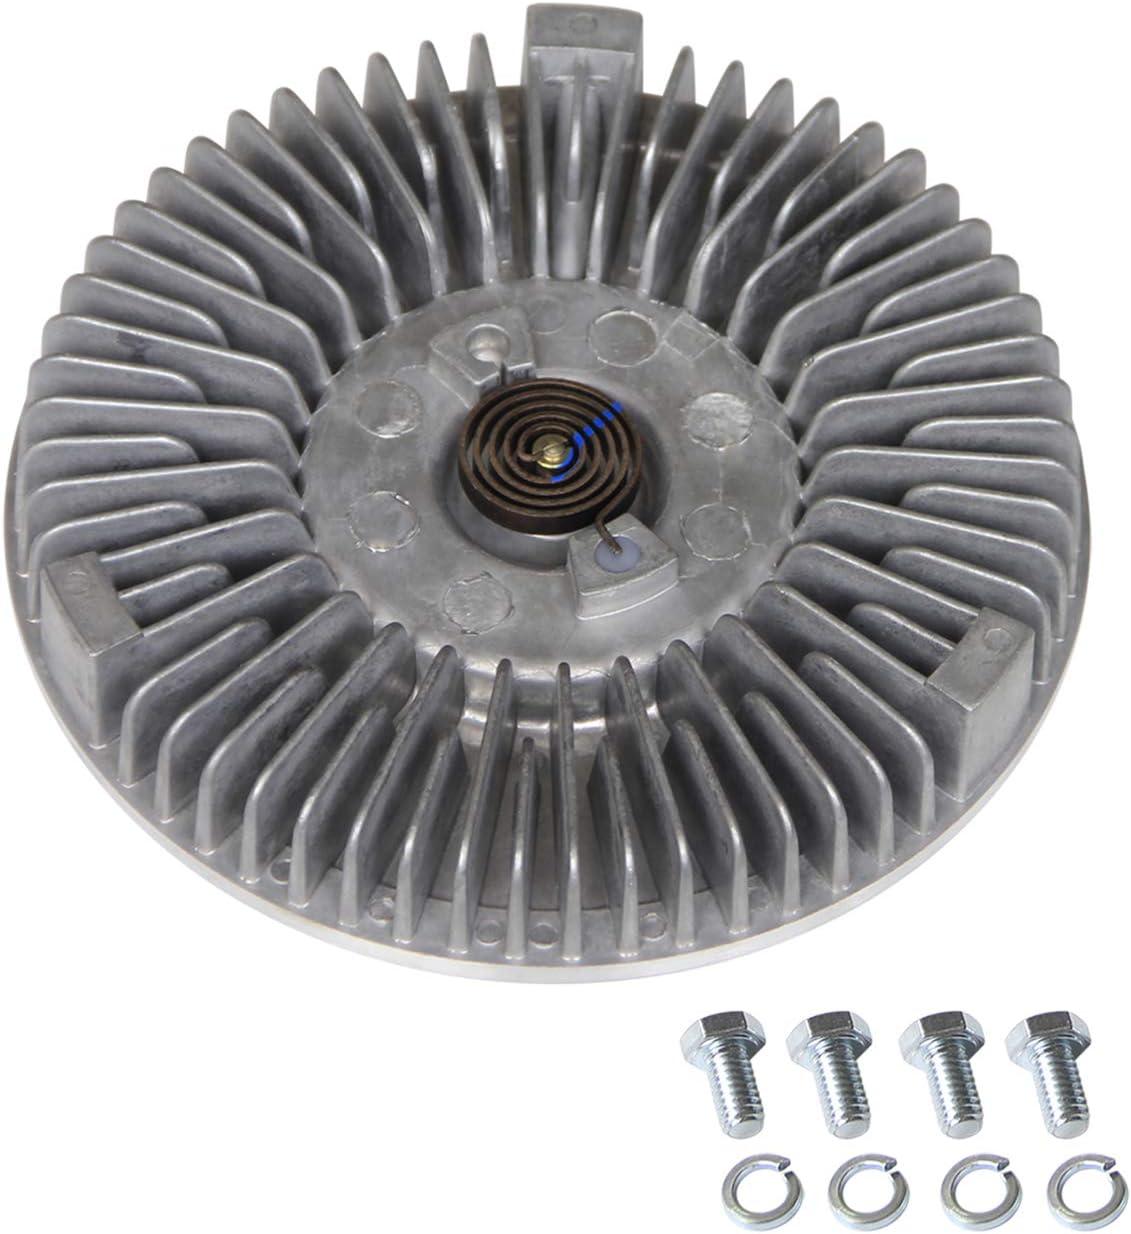 Engine Cooling Fan Clutch Radiator Fan Clutch for 1997-2000 Dodge Dakota V8 5.2L 5.9L Replace#2822